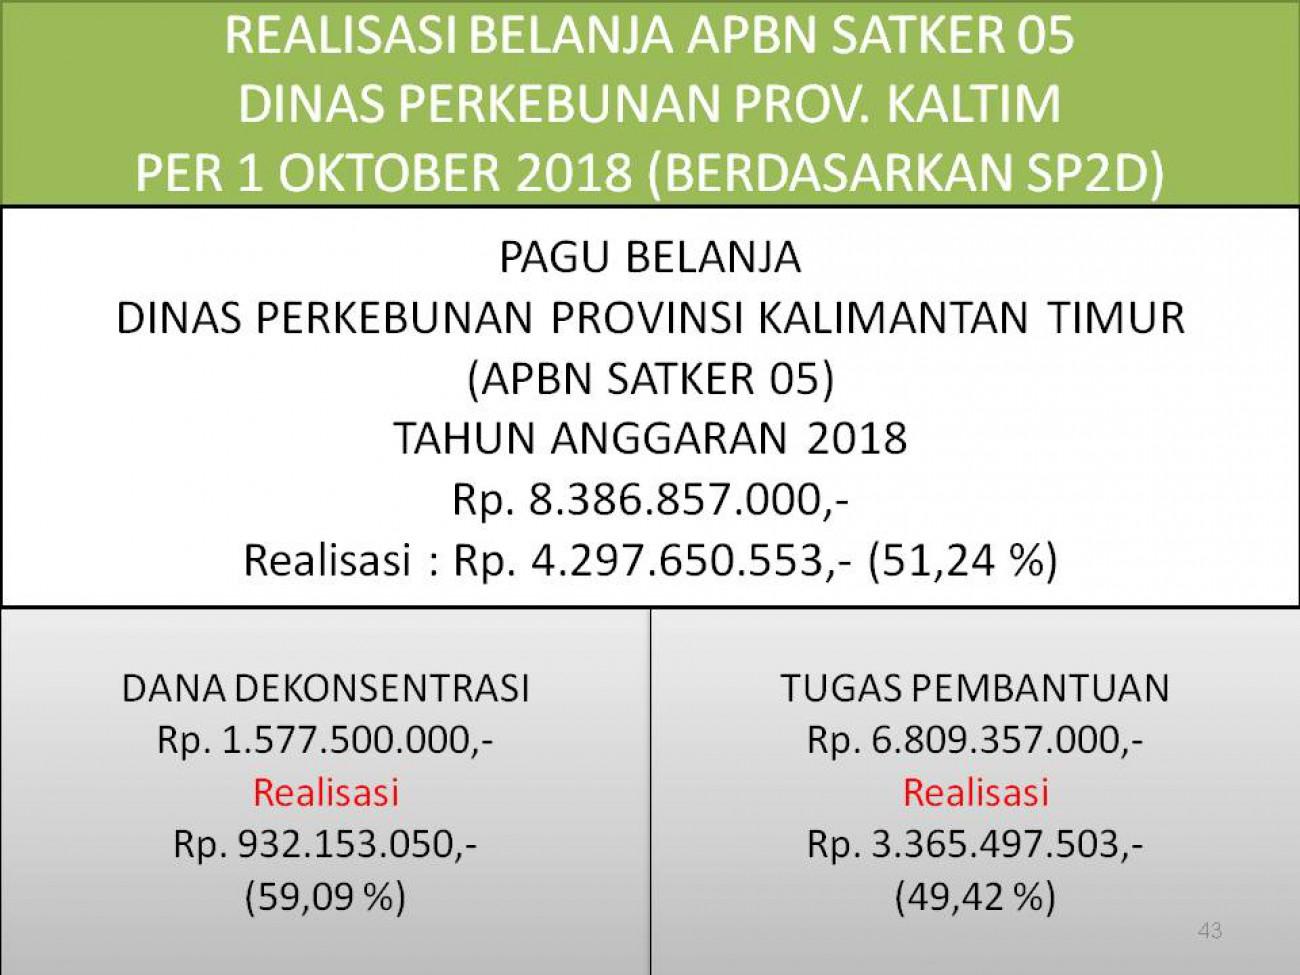 Laporan Realisasi APBN Satker 05 (Direktorat Jenderal Perkebunan) Dinas Perkebunan Prov. Kaltim Bulan September 2018